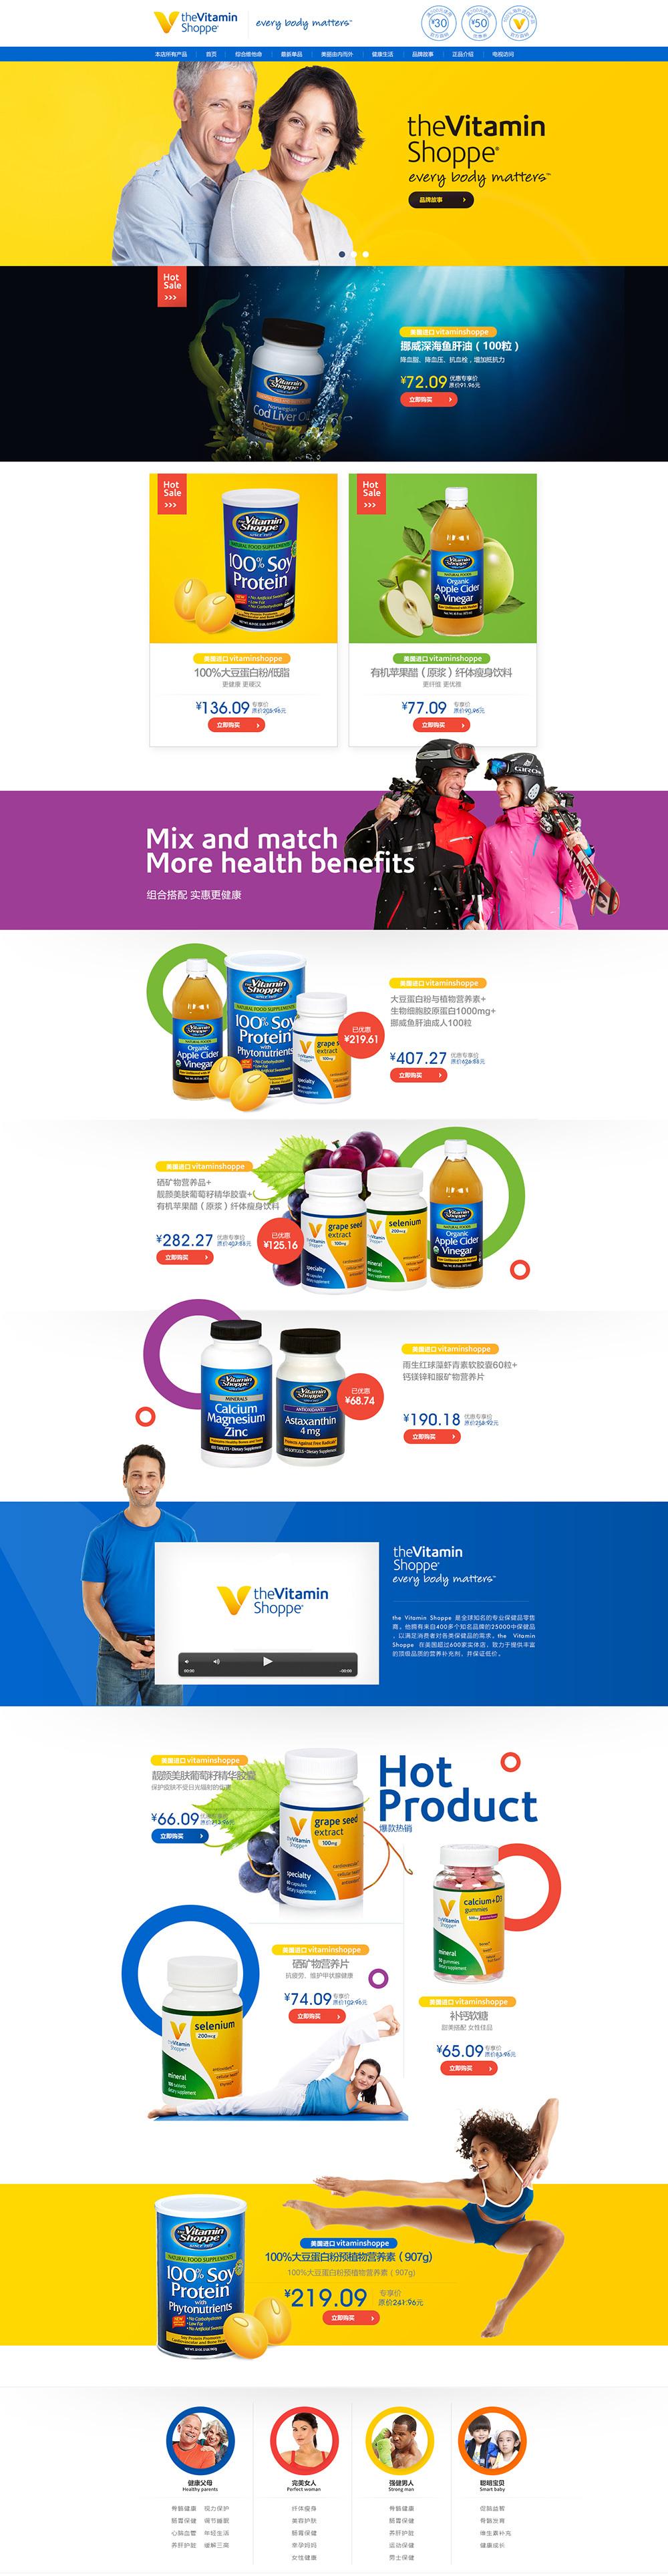 Vitamin Shoppe天猫店铺设计图0